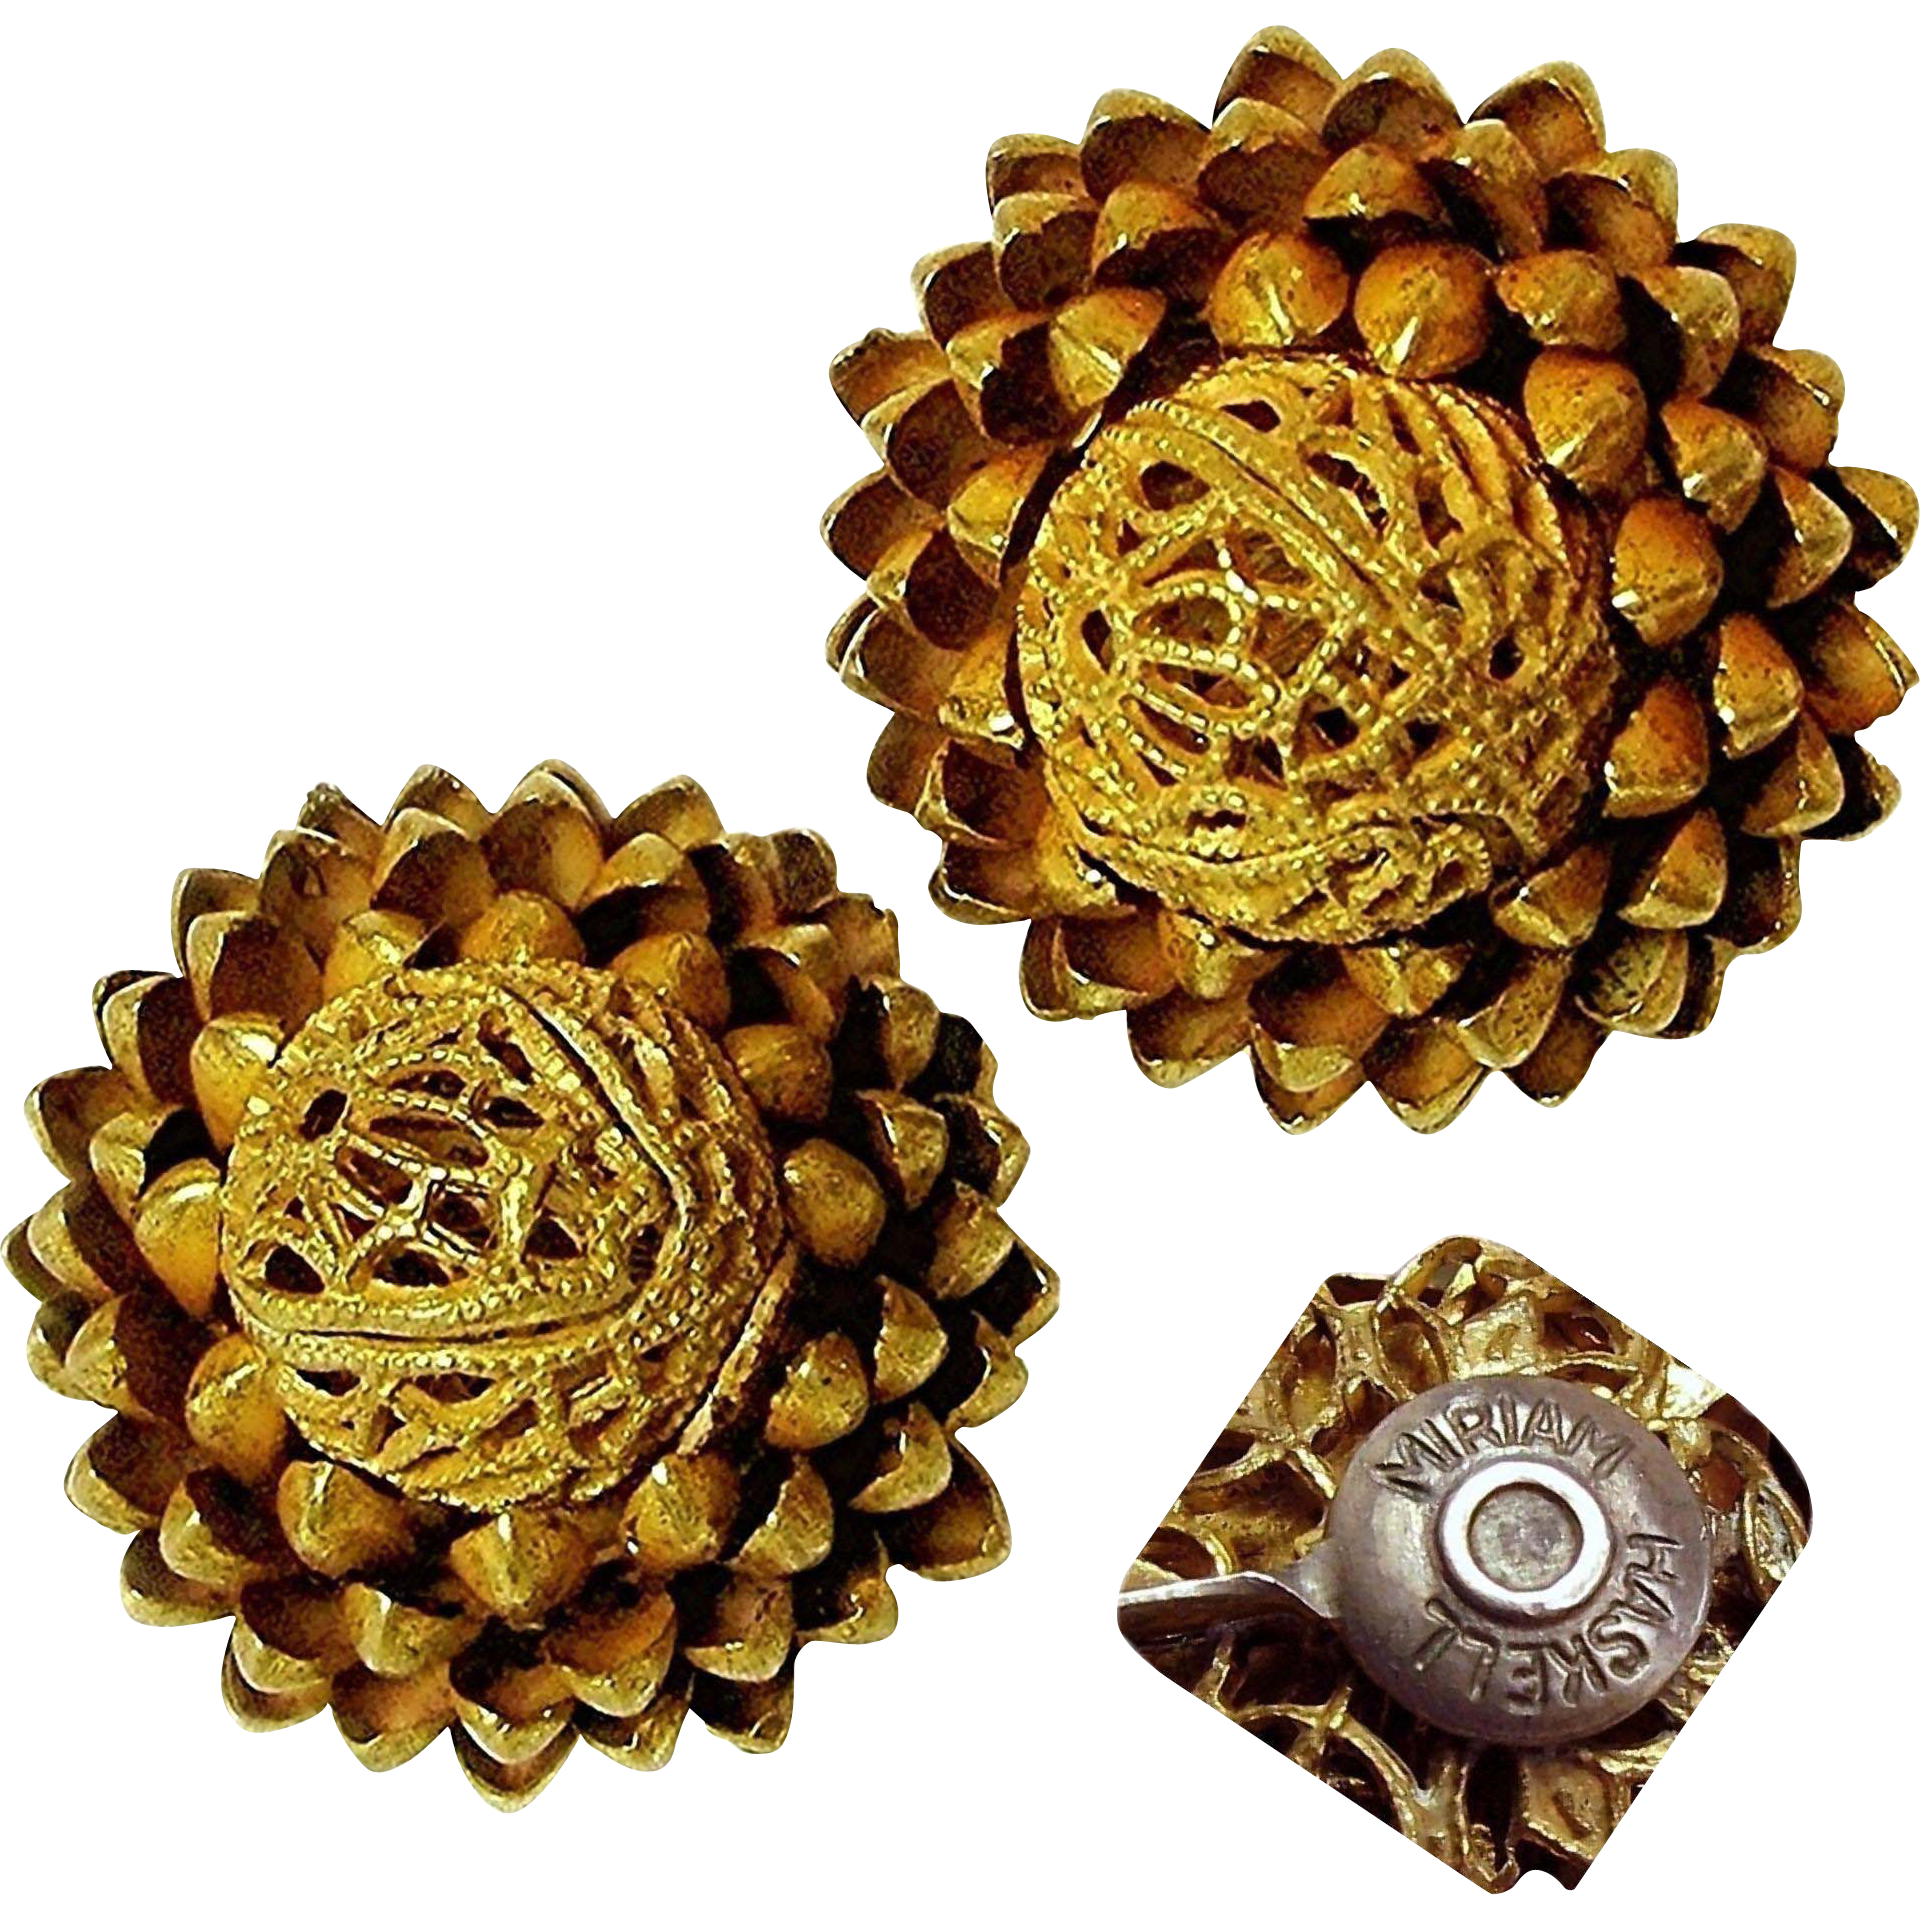 Vintage MIRIAM HASKELL PINECONE Earrings of Russian Gilt Filigree